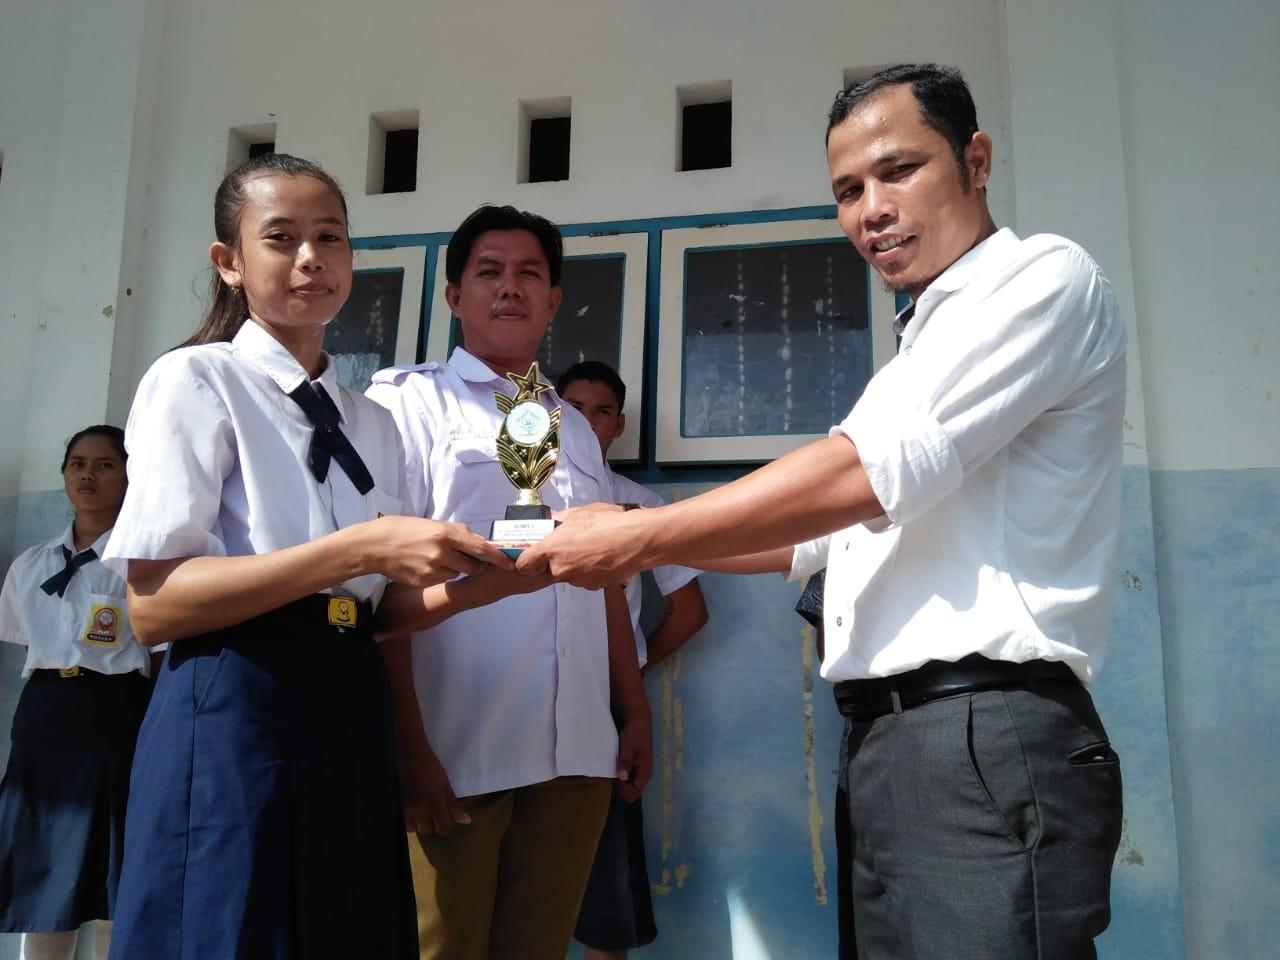 Potret Pendidikan di Daerah 3 T Kepulauan Riau